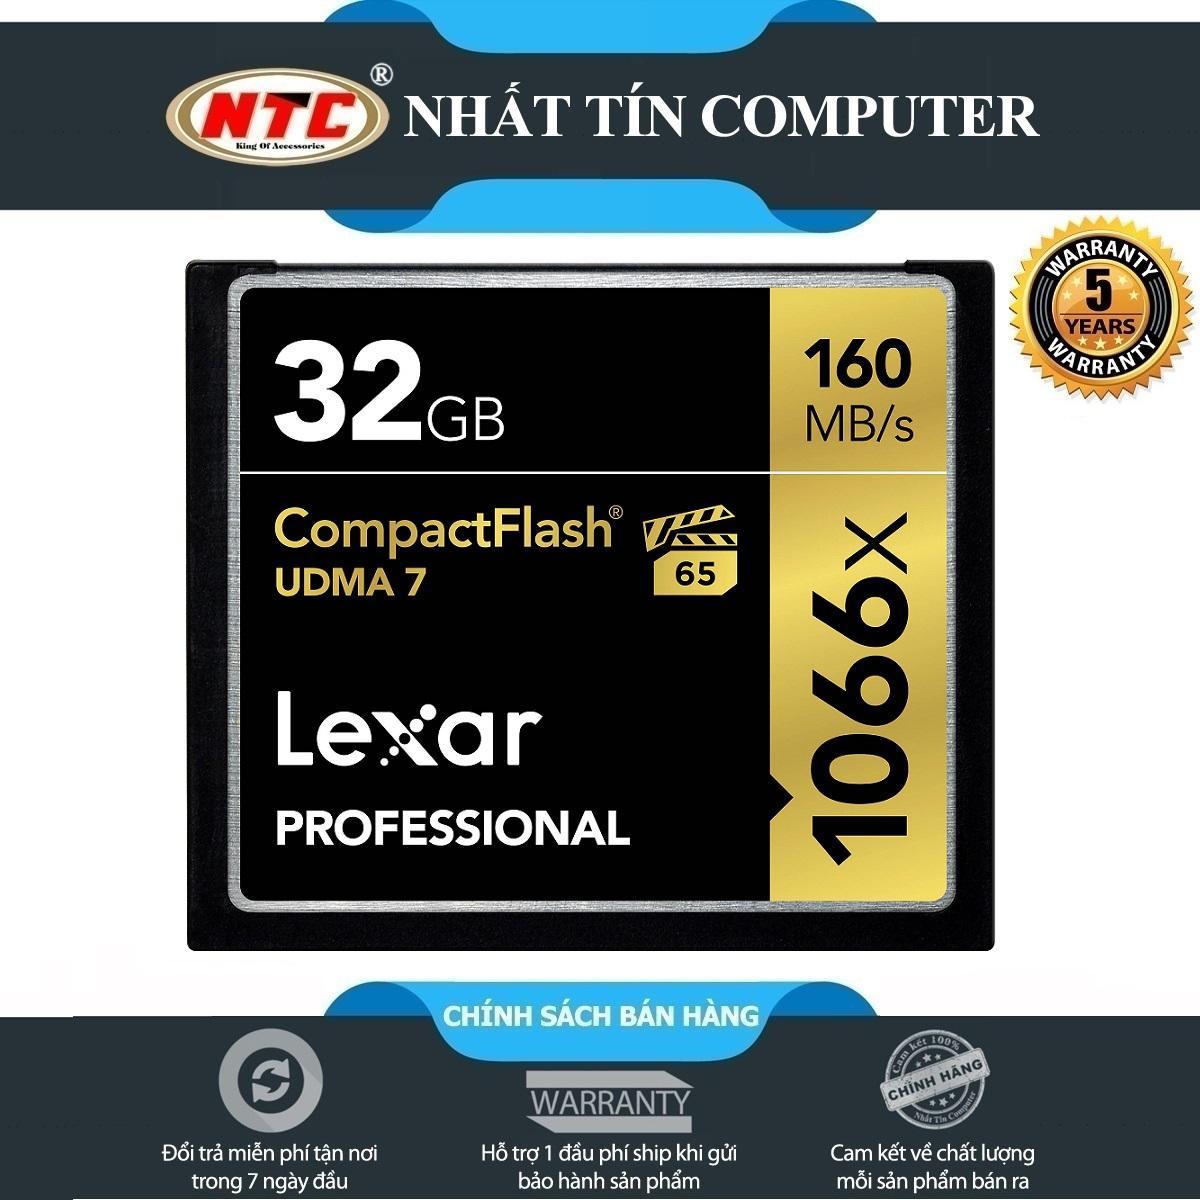 Thẻ Nhớ CF (CompactFlash) Lexar Professional 1066X 32GB 160MB/s Đen)